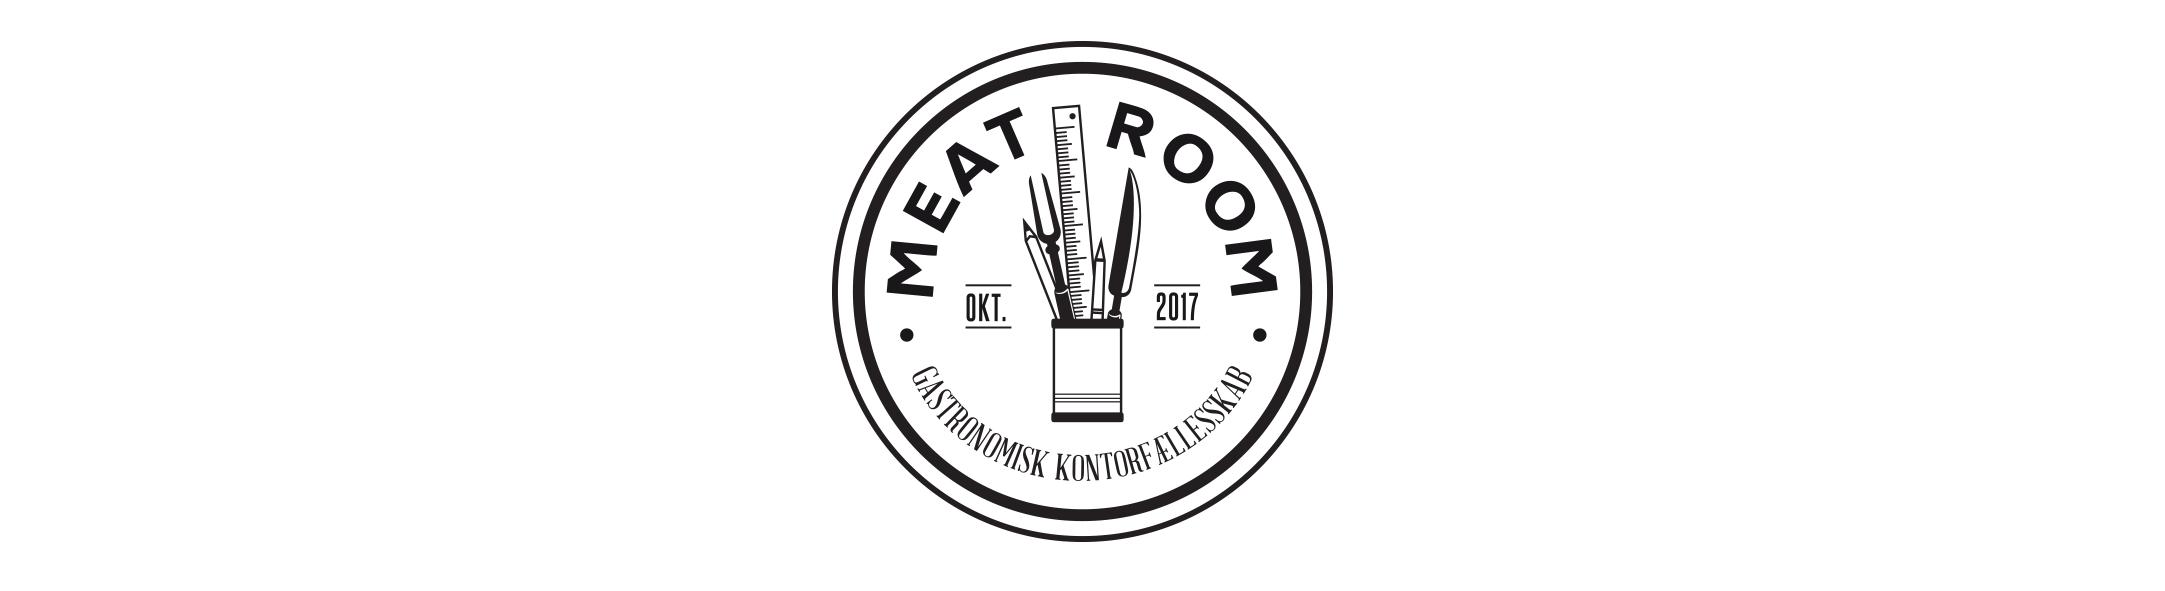 MeatRoom